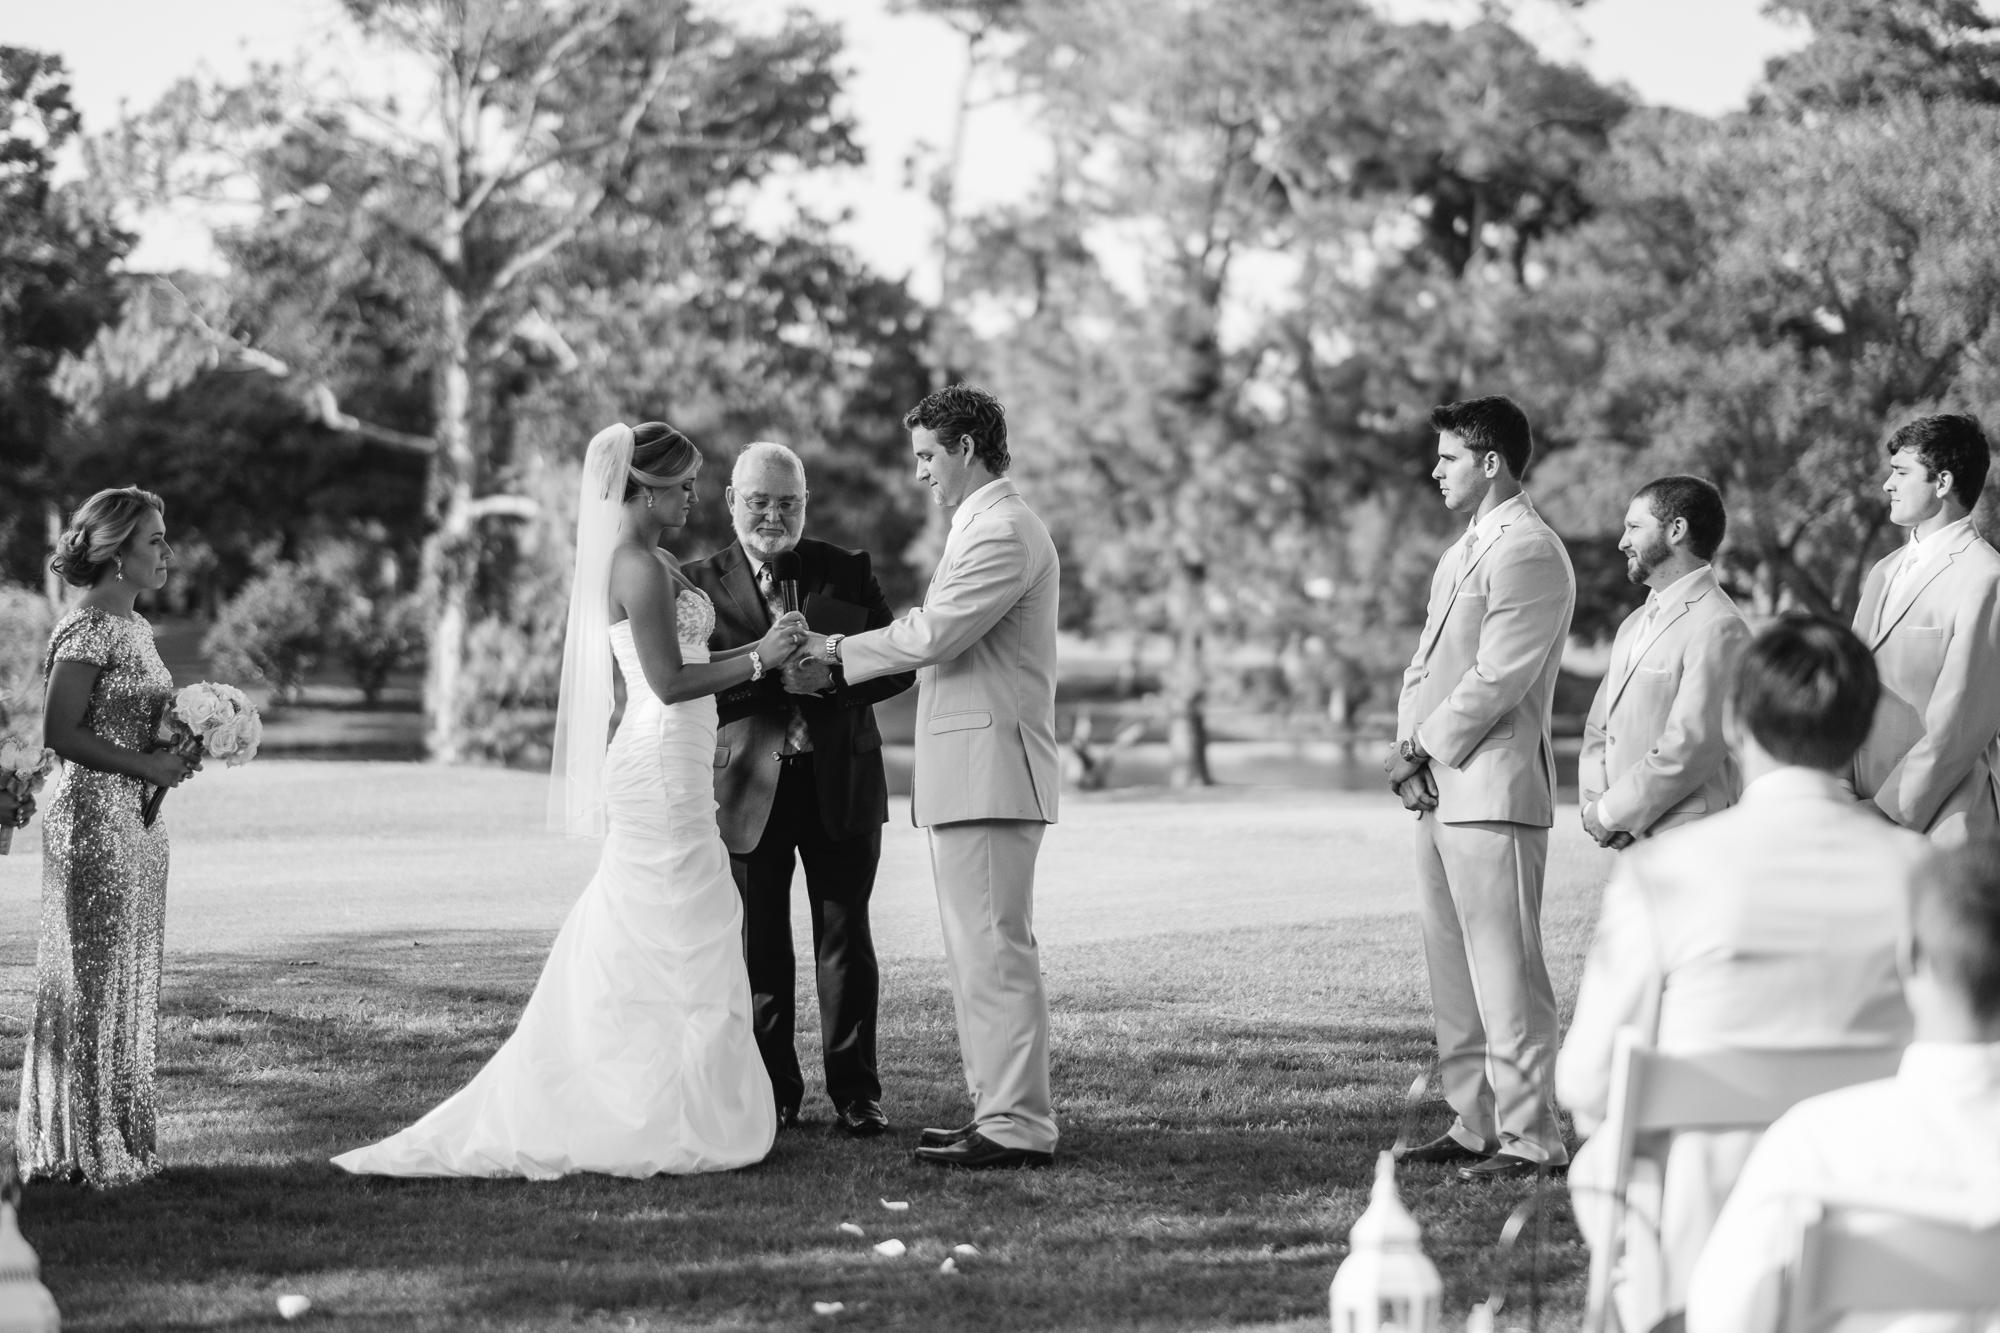 Heather-Chris-wedding-blog-20.jpg